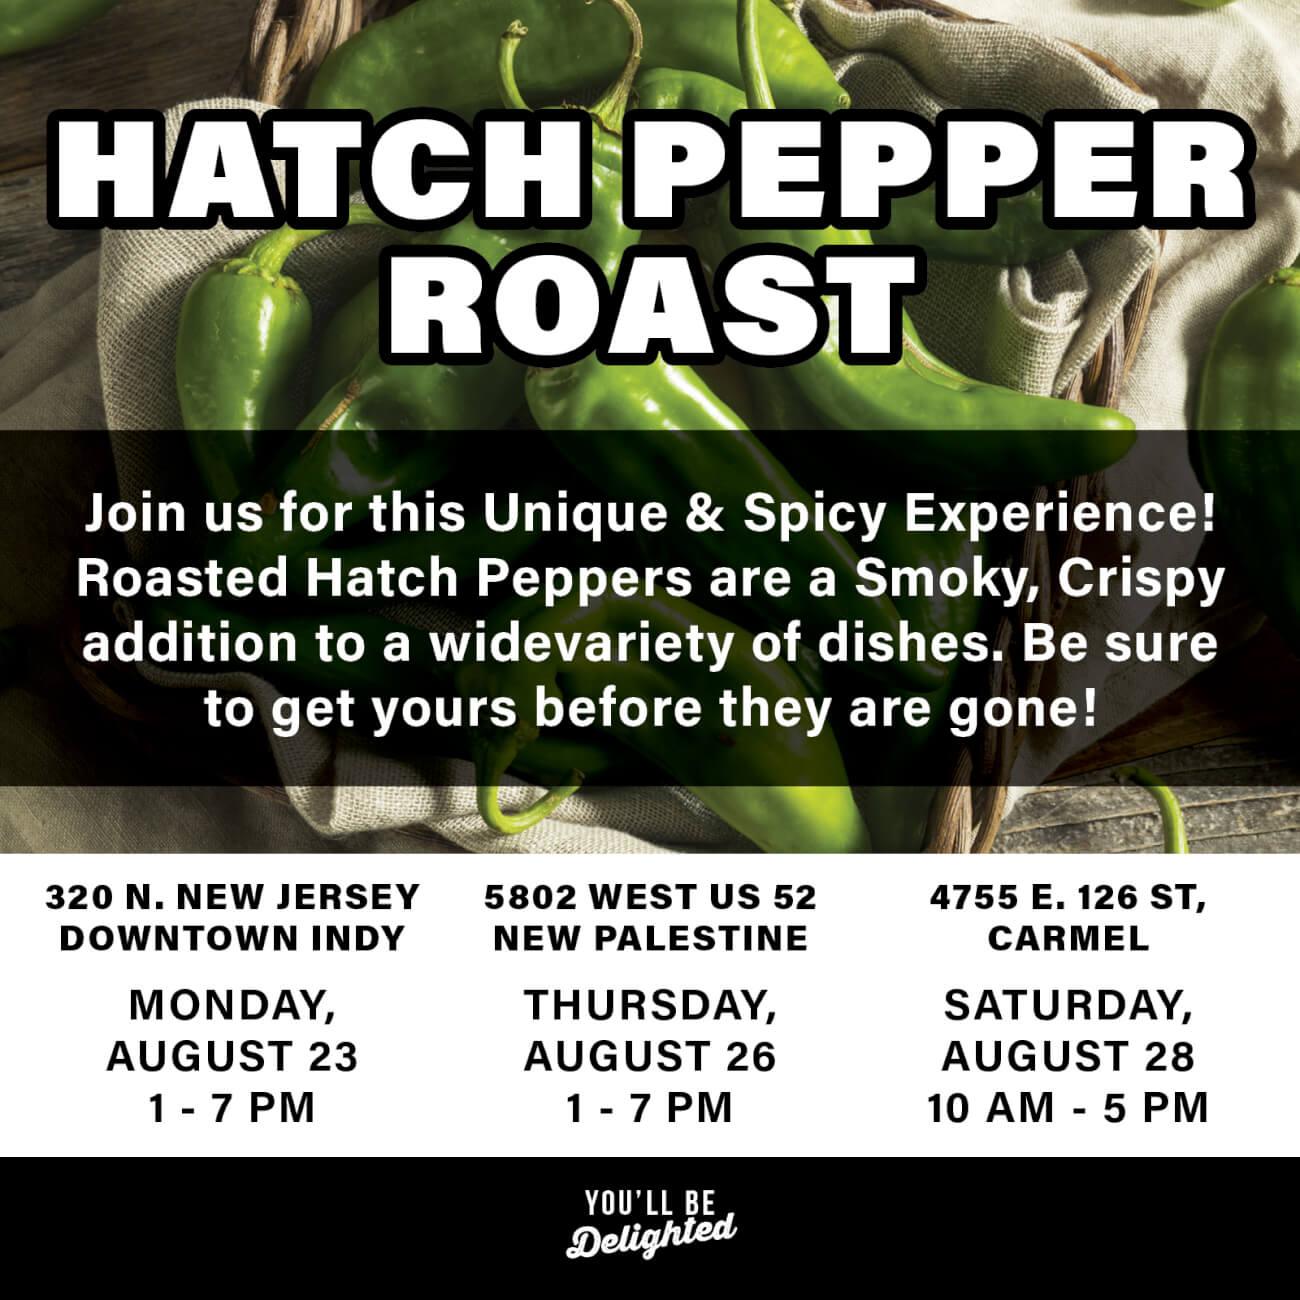 Hatch Pepper Roast